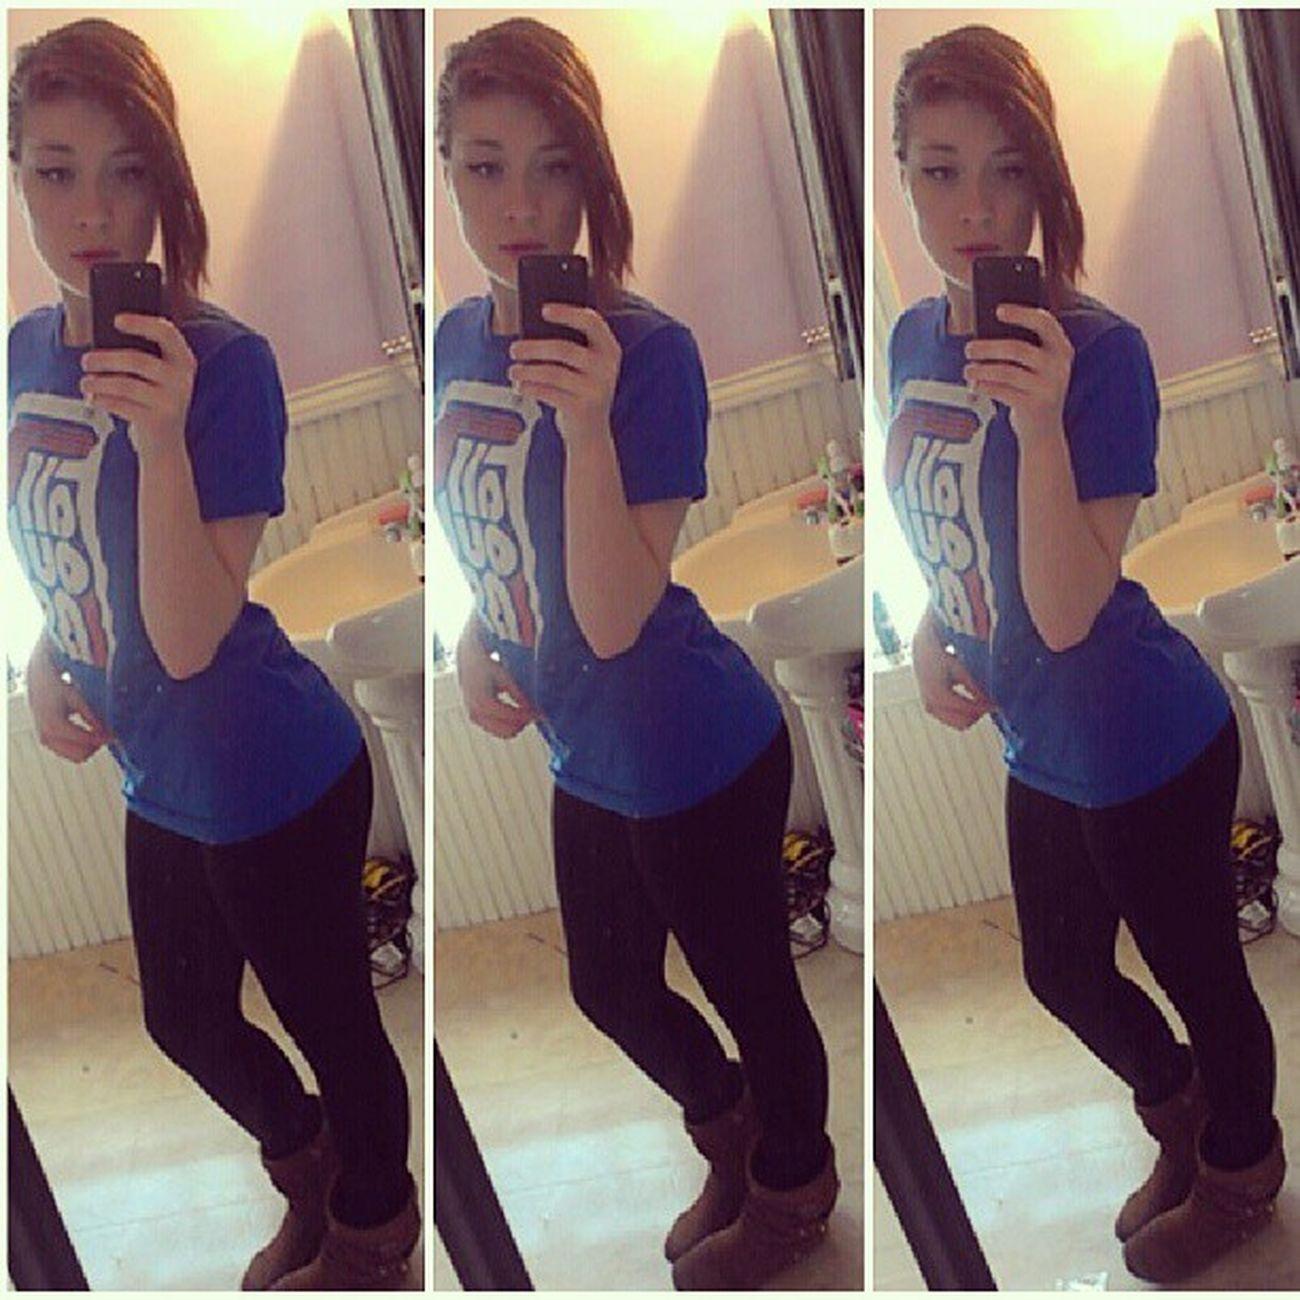 Ugh. Selfie Bathroom Mymirrorisalwaysdirty Ilikeitdirty hainnuendofalloutboyFOBivegottroubledthoughtsandaselfesteemtomatchwhatacatchtransformationtuesdayisupnextSTAYTUNEDINSTAGRAMMERSgirlswithplugsplugsbodymodsleggingsalldayeveryday